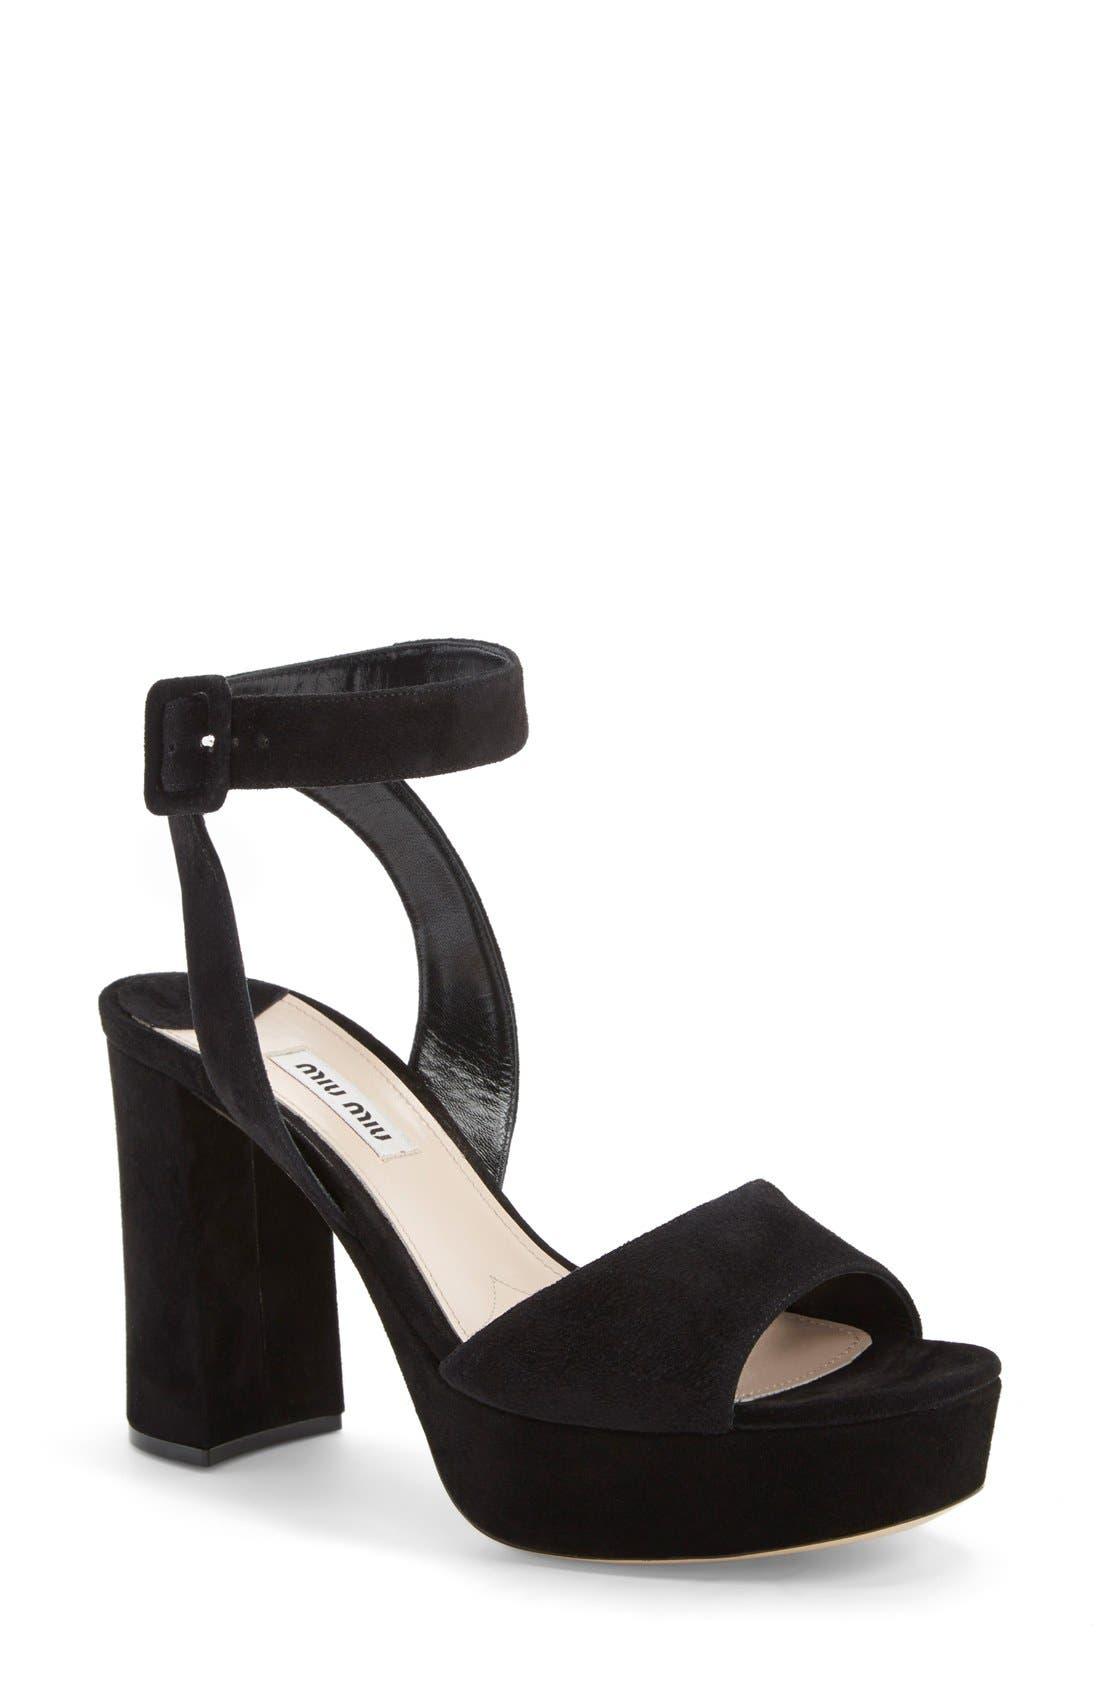 Alternate Image 1 Selected - Miu Miu Block Heel Platform Sandal (Women)